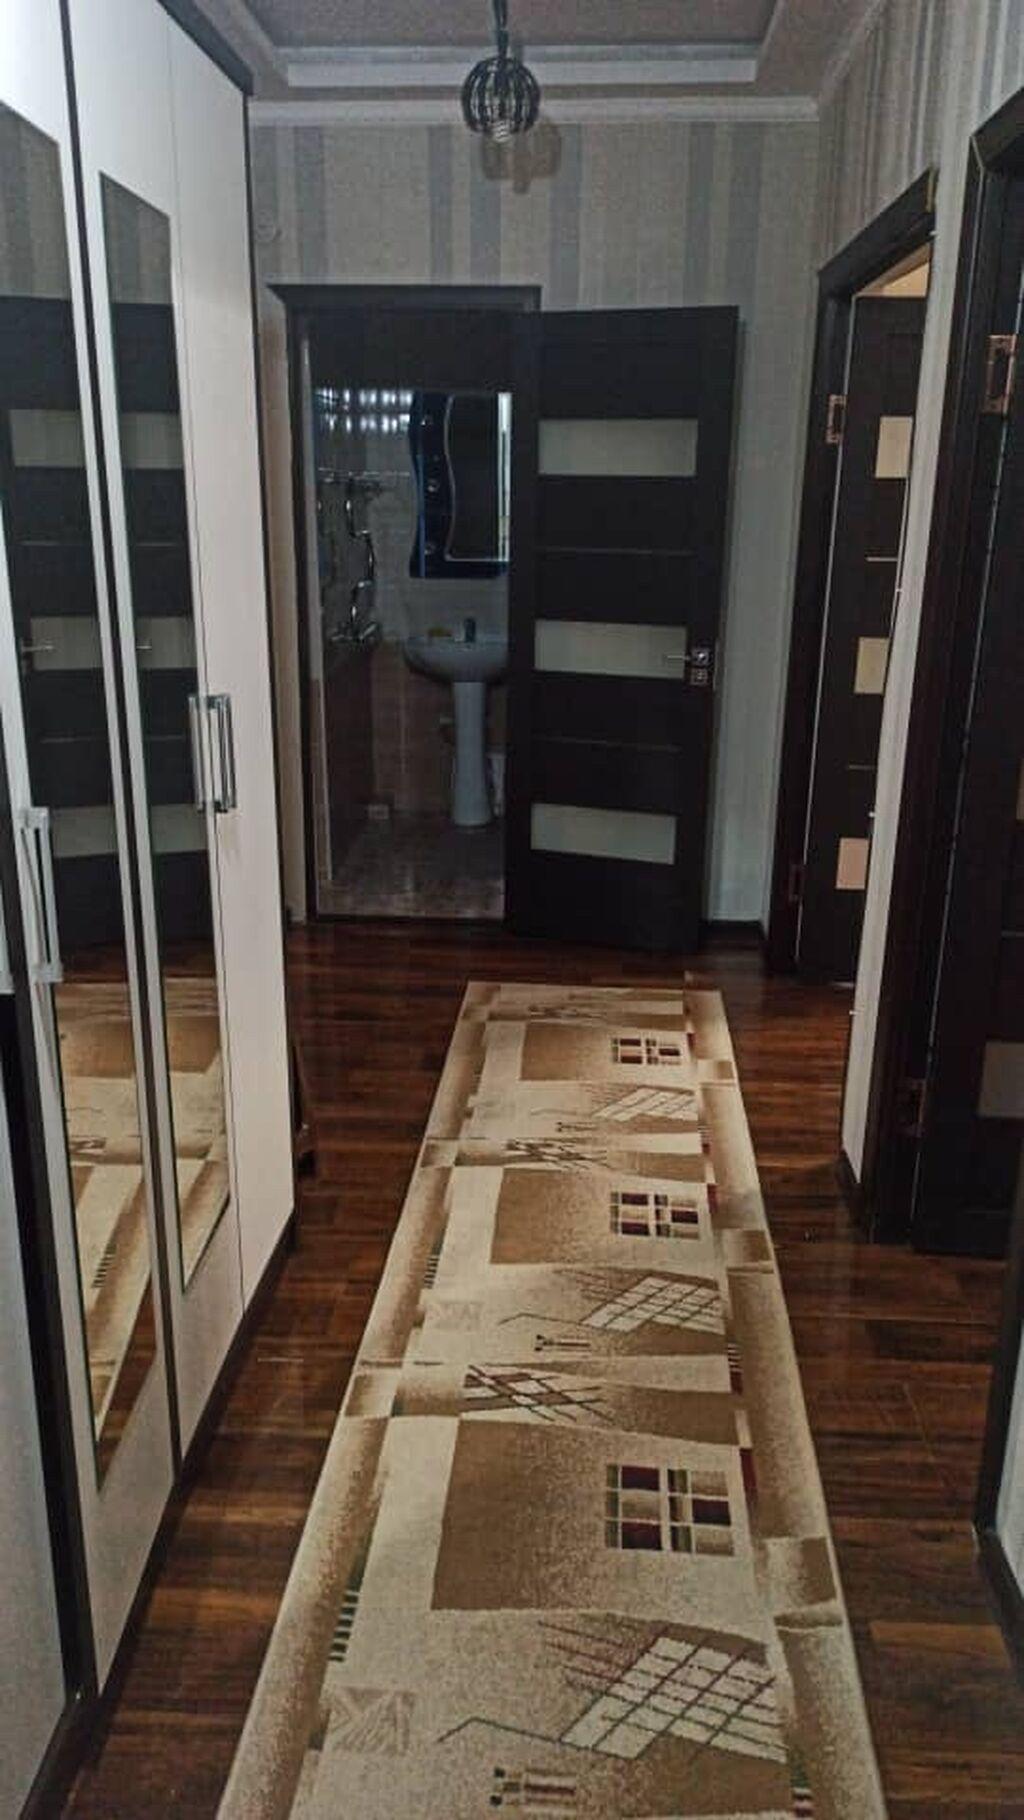 Сдается квартира: 2 комнаты, 5854483 кв. м, Бишкек: Сдается квартира: 2 комнаты, 5854483 кв. м, Бишкек